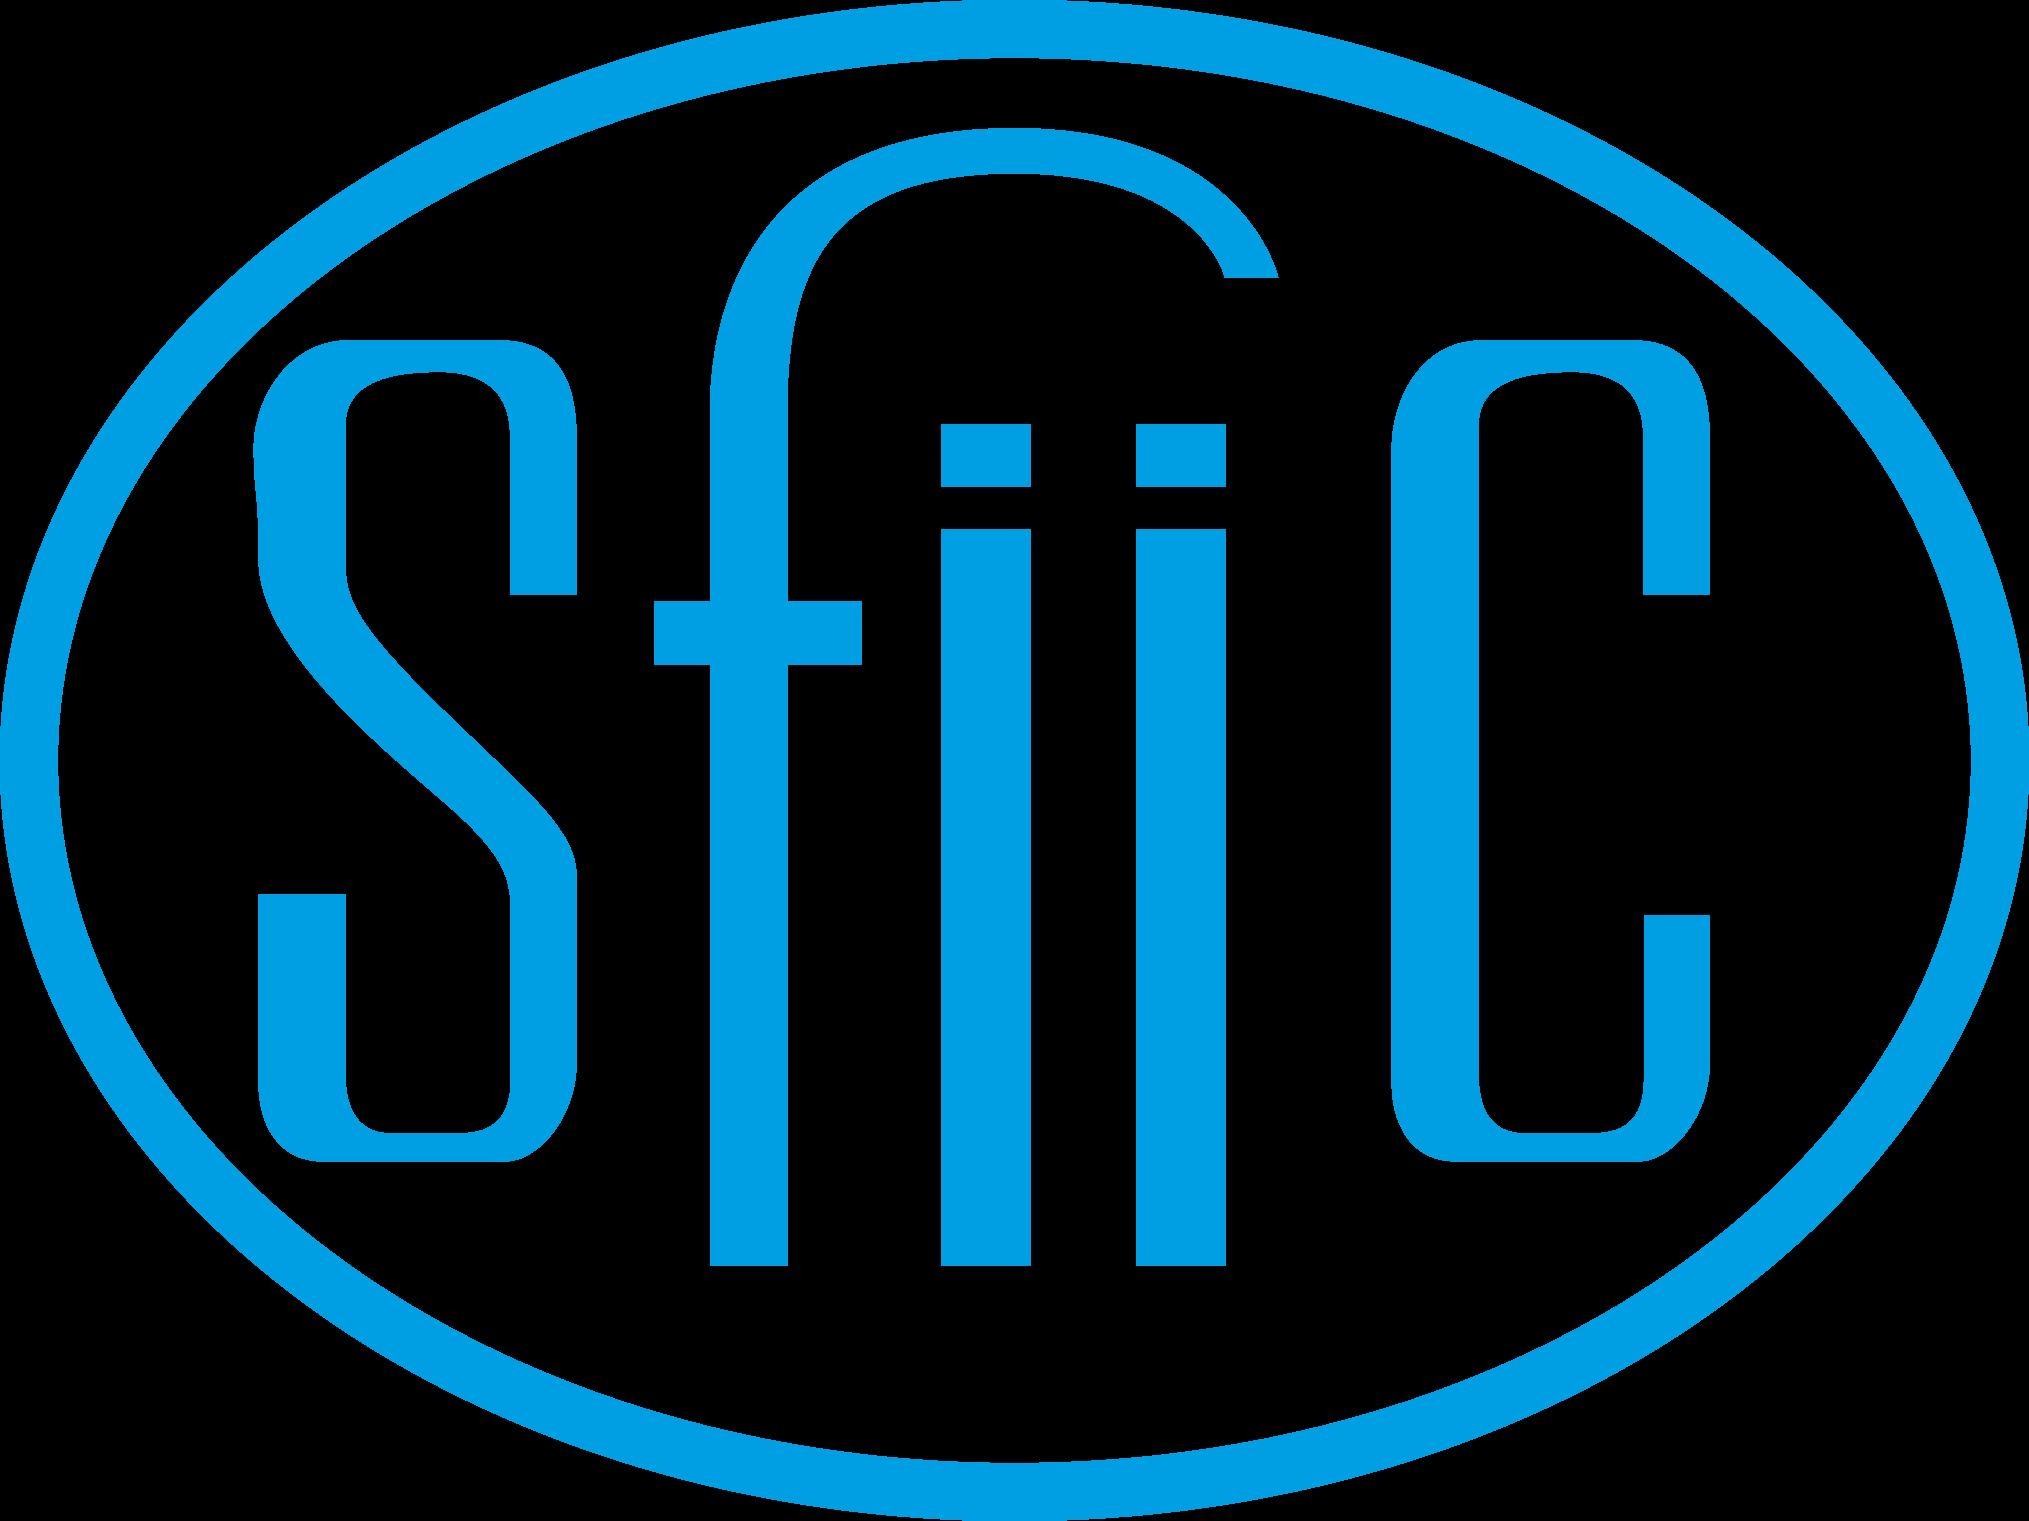 SFIIC